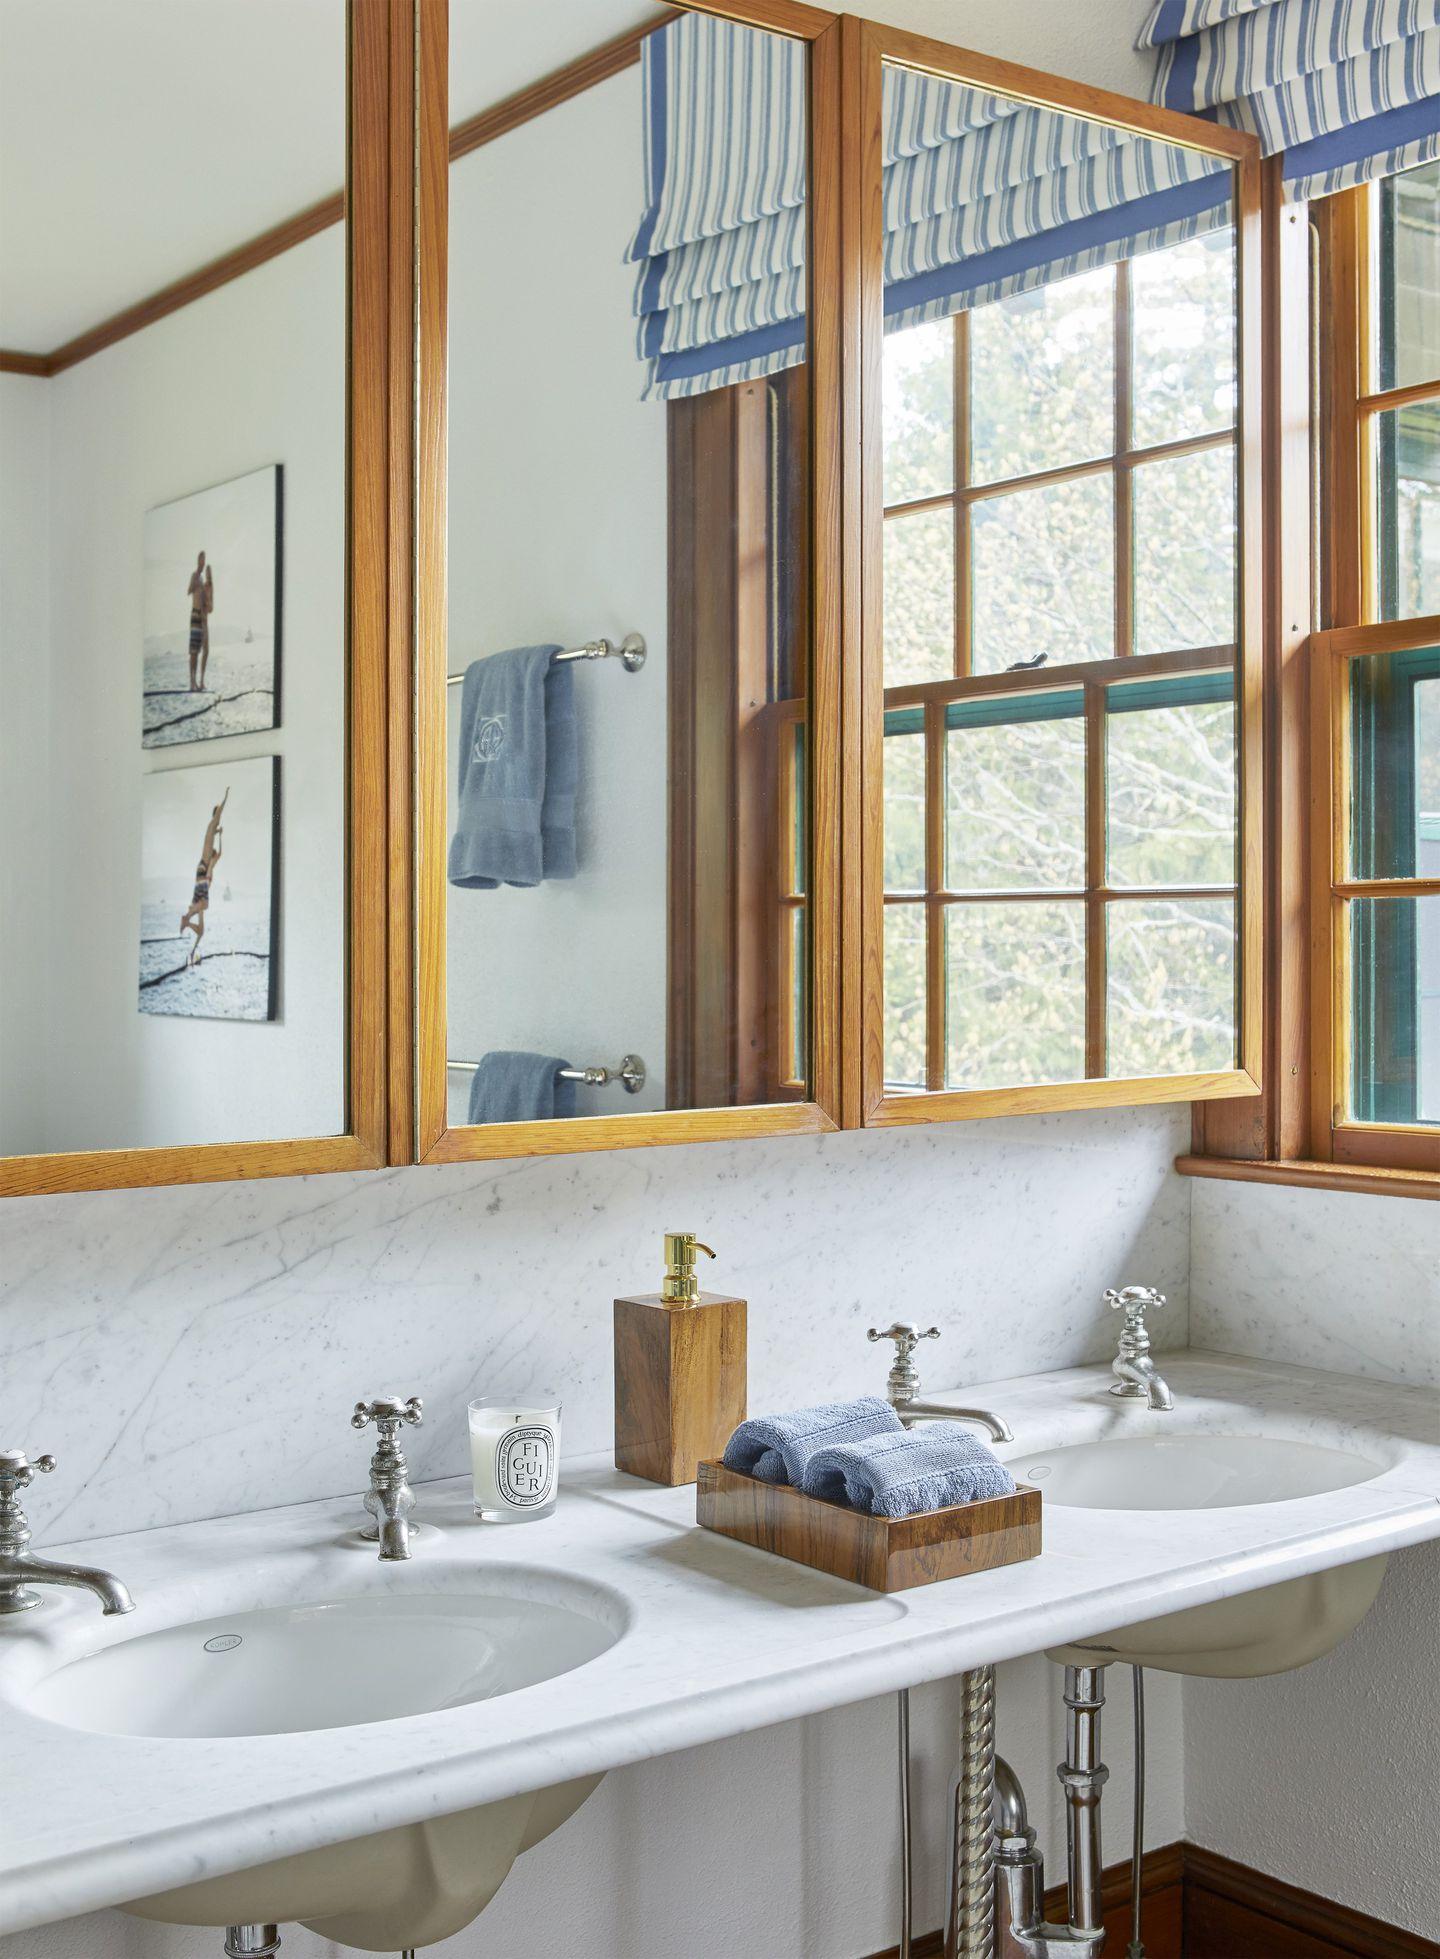 eastholm-emily-gilbert-dual-sinks